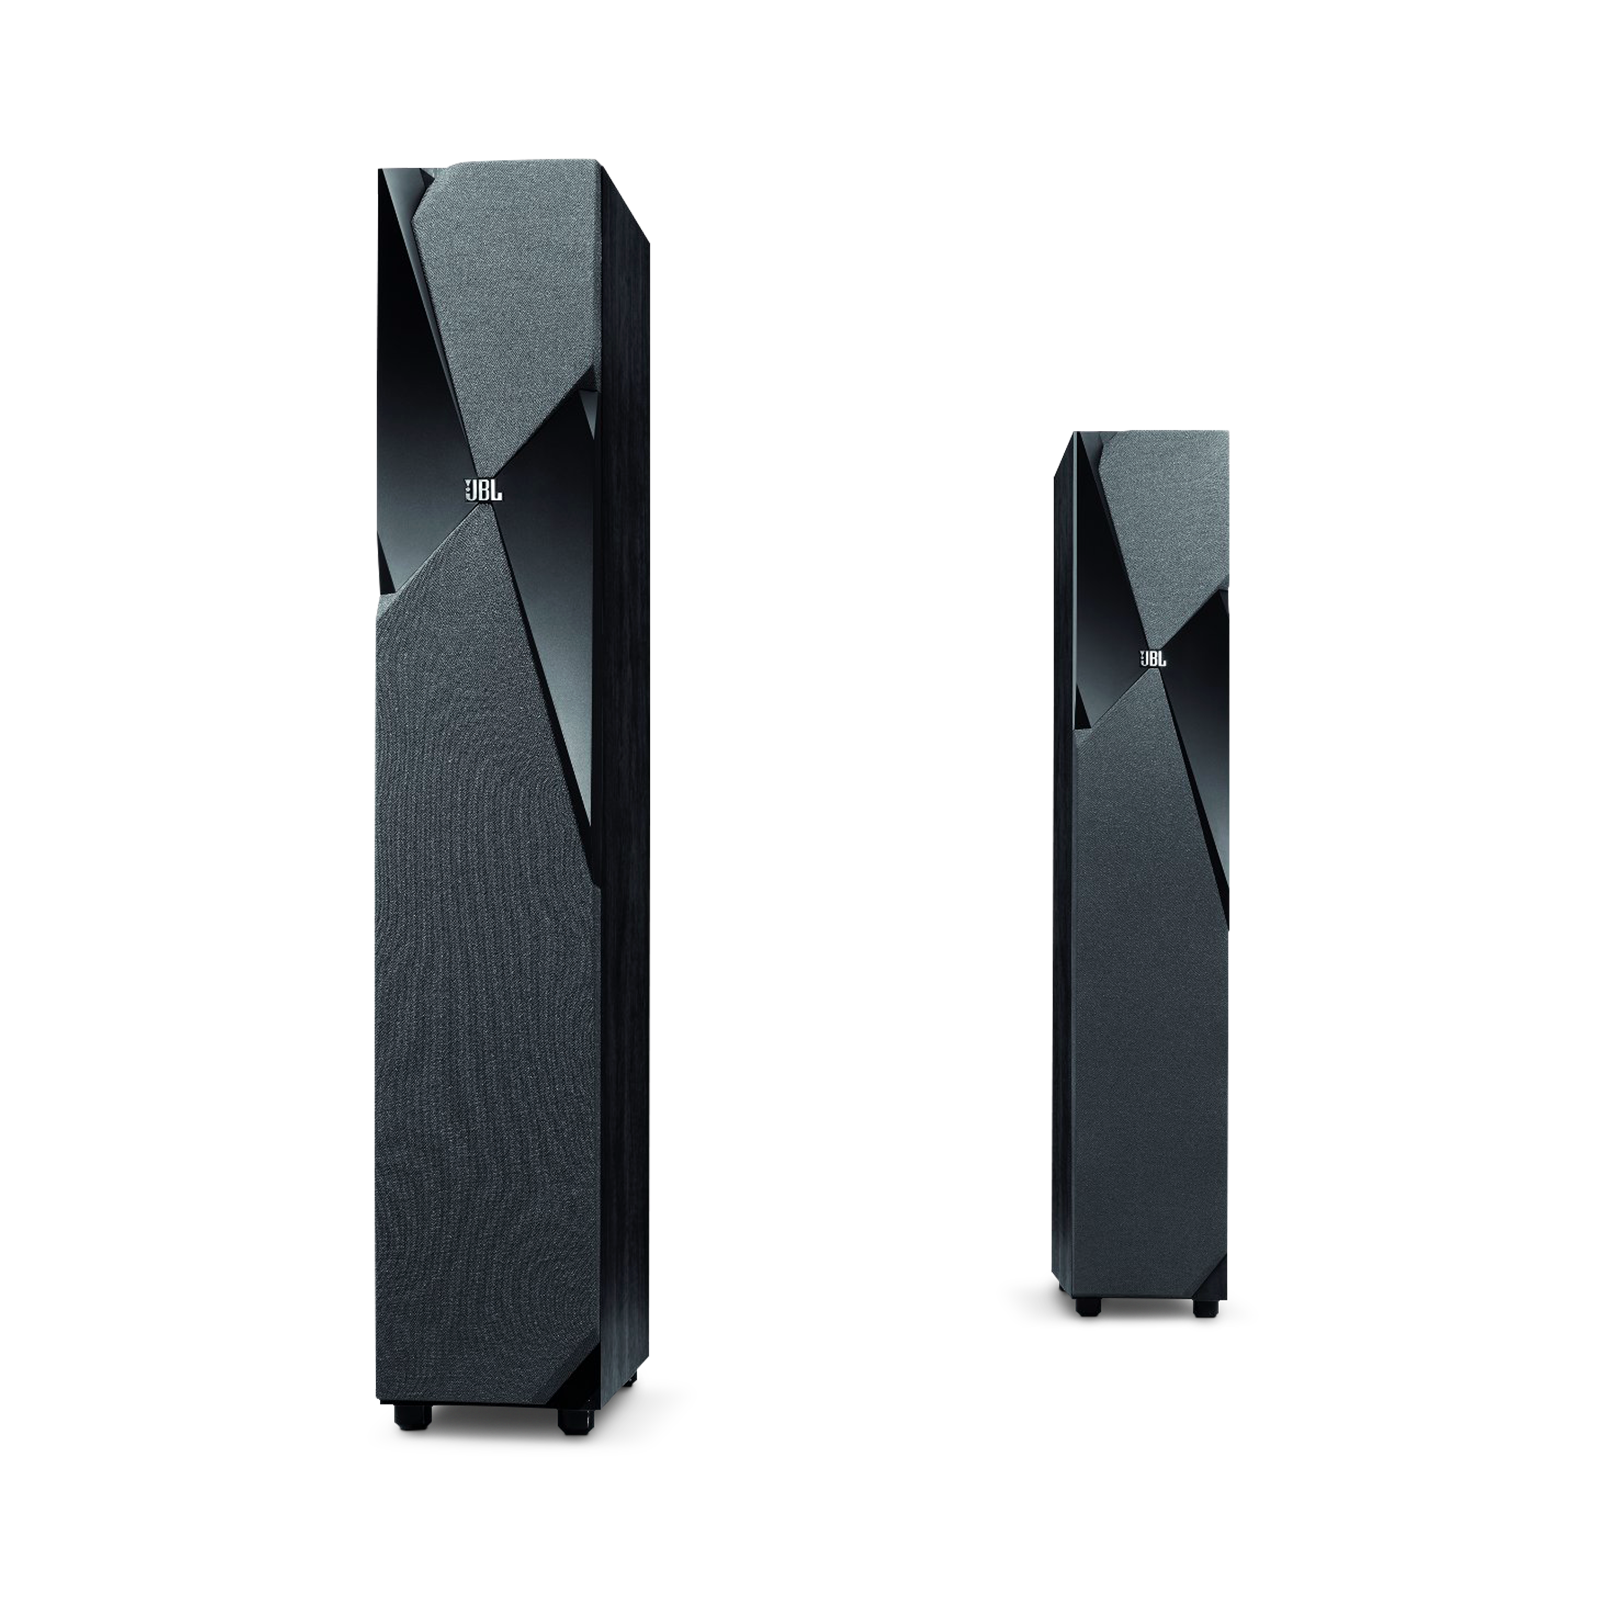 Studio 190 Wide Range 400 Watt 3 Way Floorstanding Speaker Onyx 1 Harman Kardon International Warranty